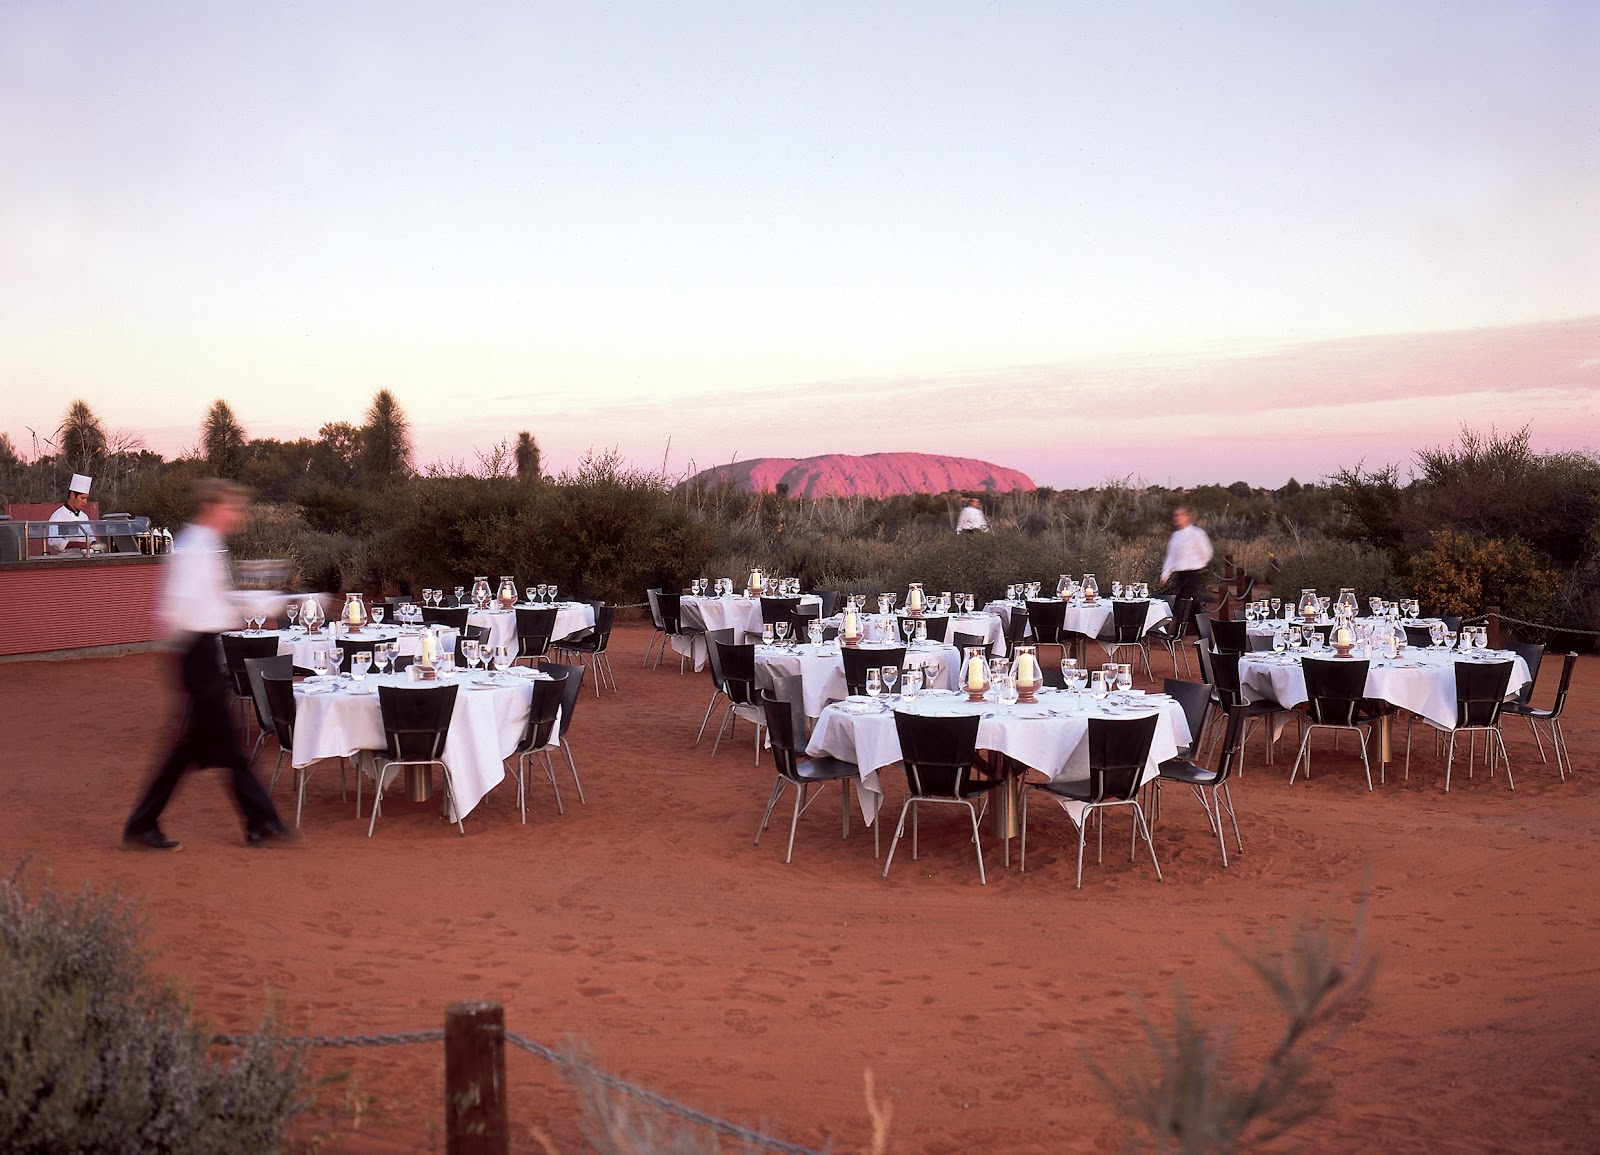 Sounds Of Silence, Uluru (Ayers Rock)